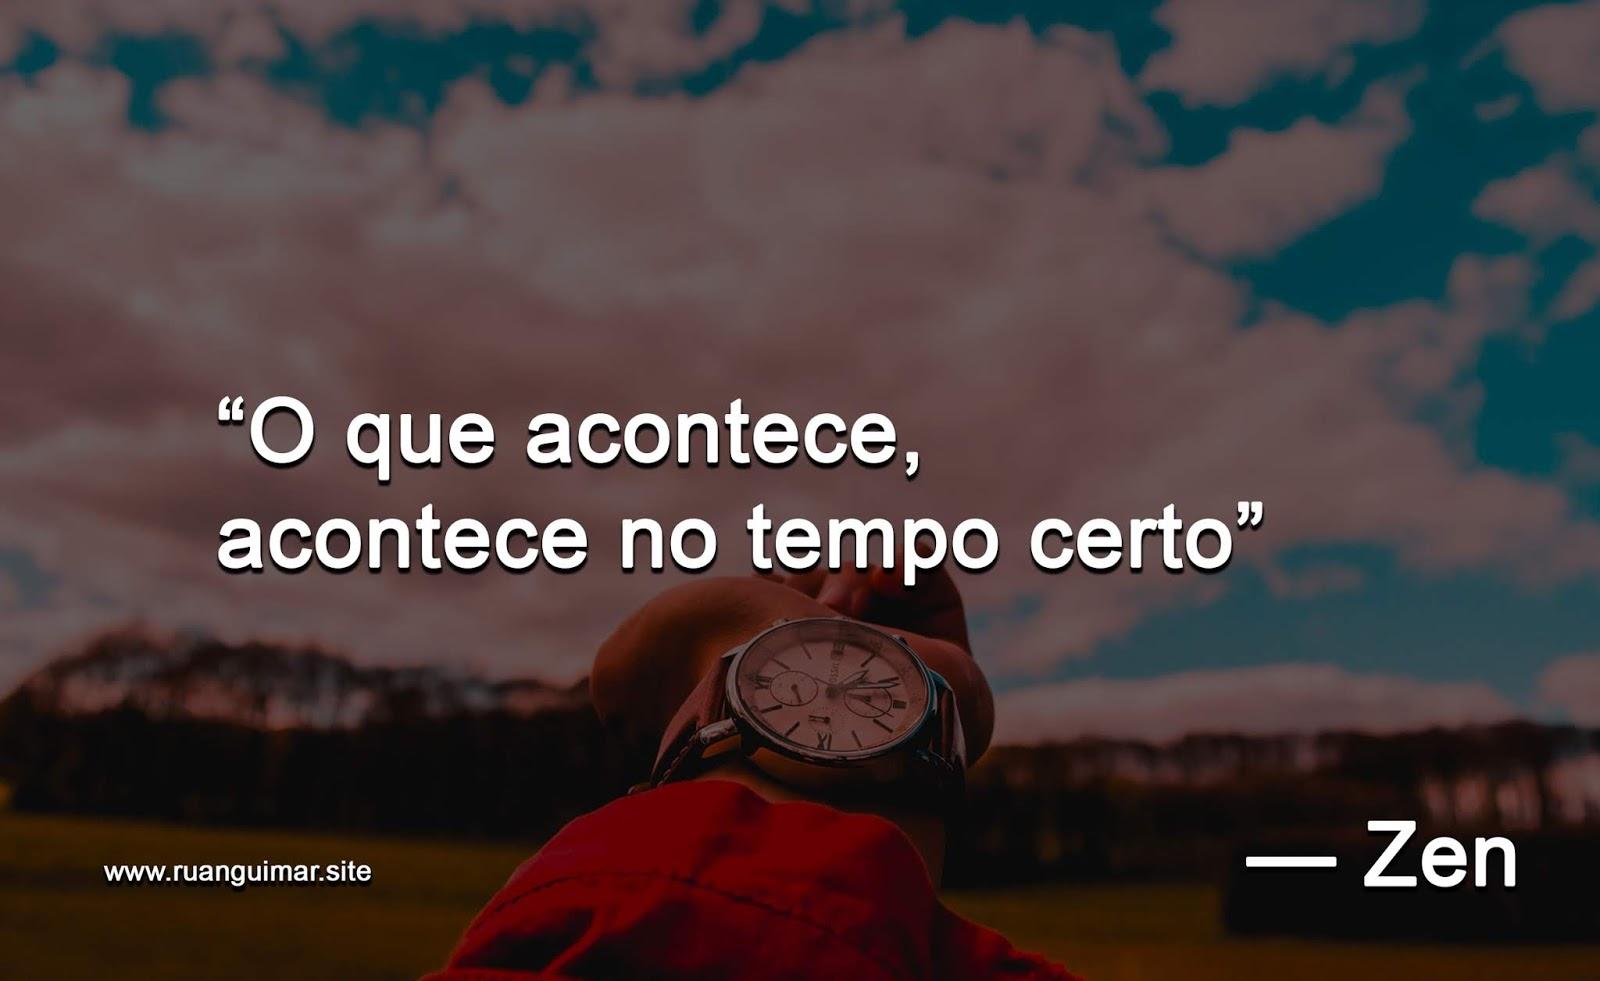 O que acontece, acontece no tempo certo.